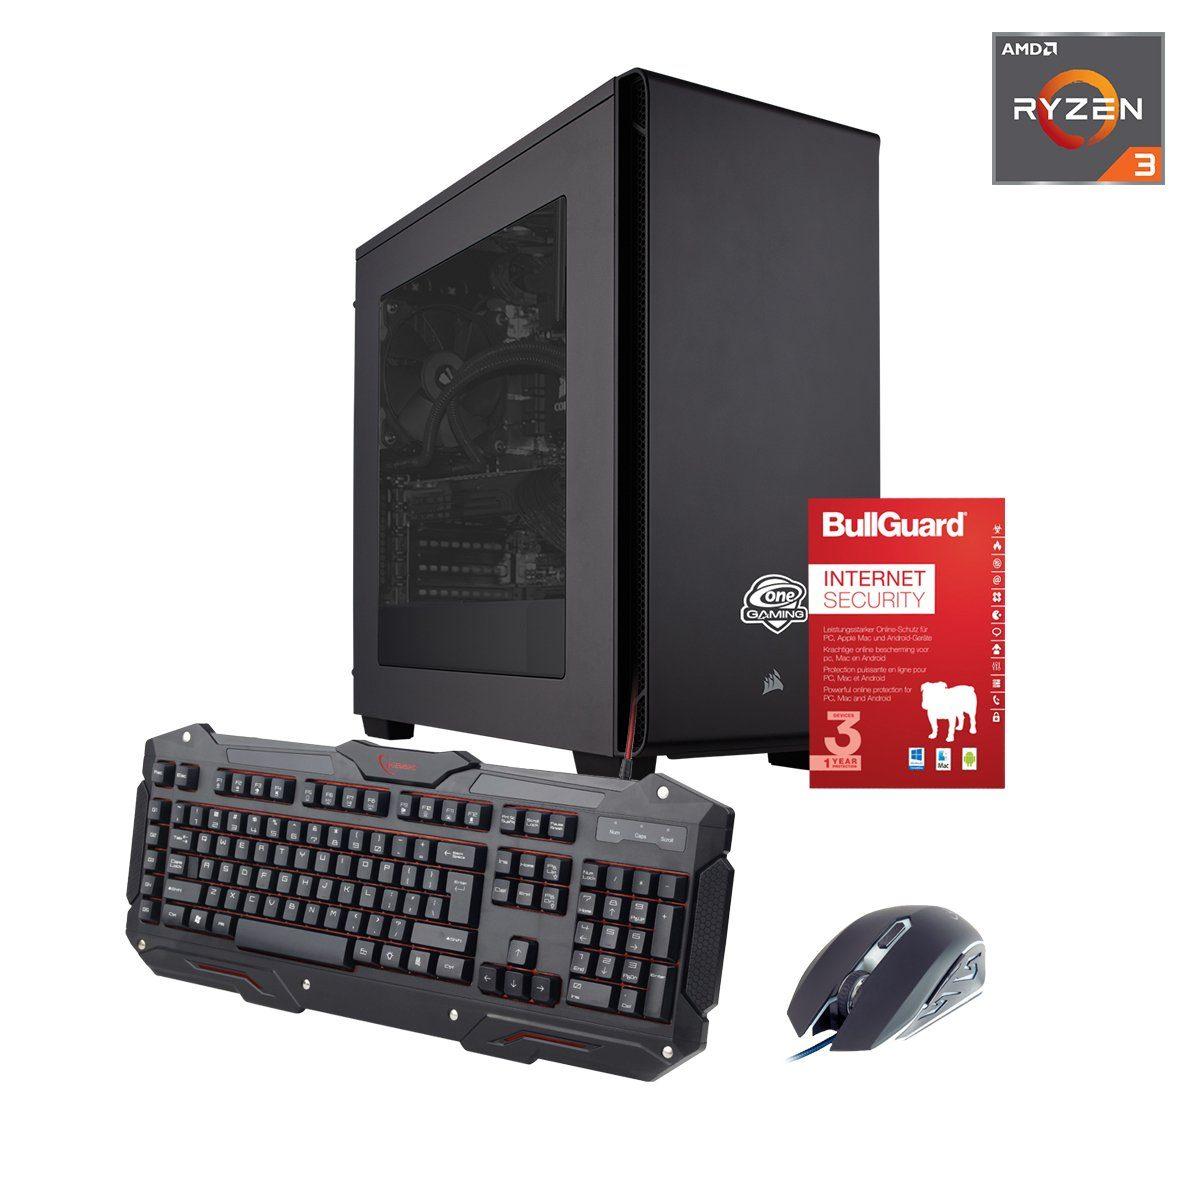 ONE GAMING PC, Ryzen 3 1200, Radeon RX 550, 8GB DDR4 SDRAM »PC 44534«